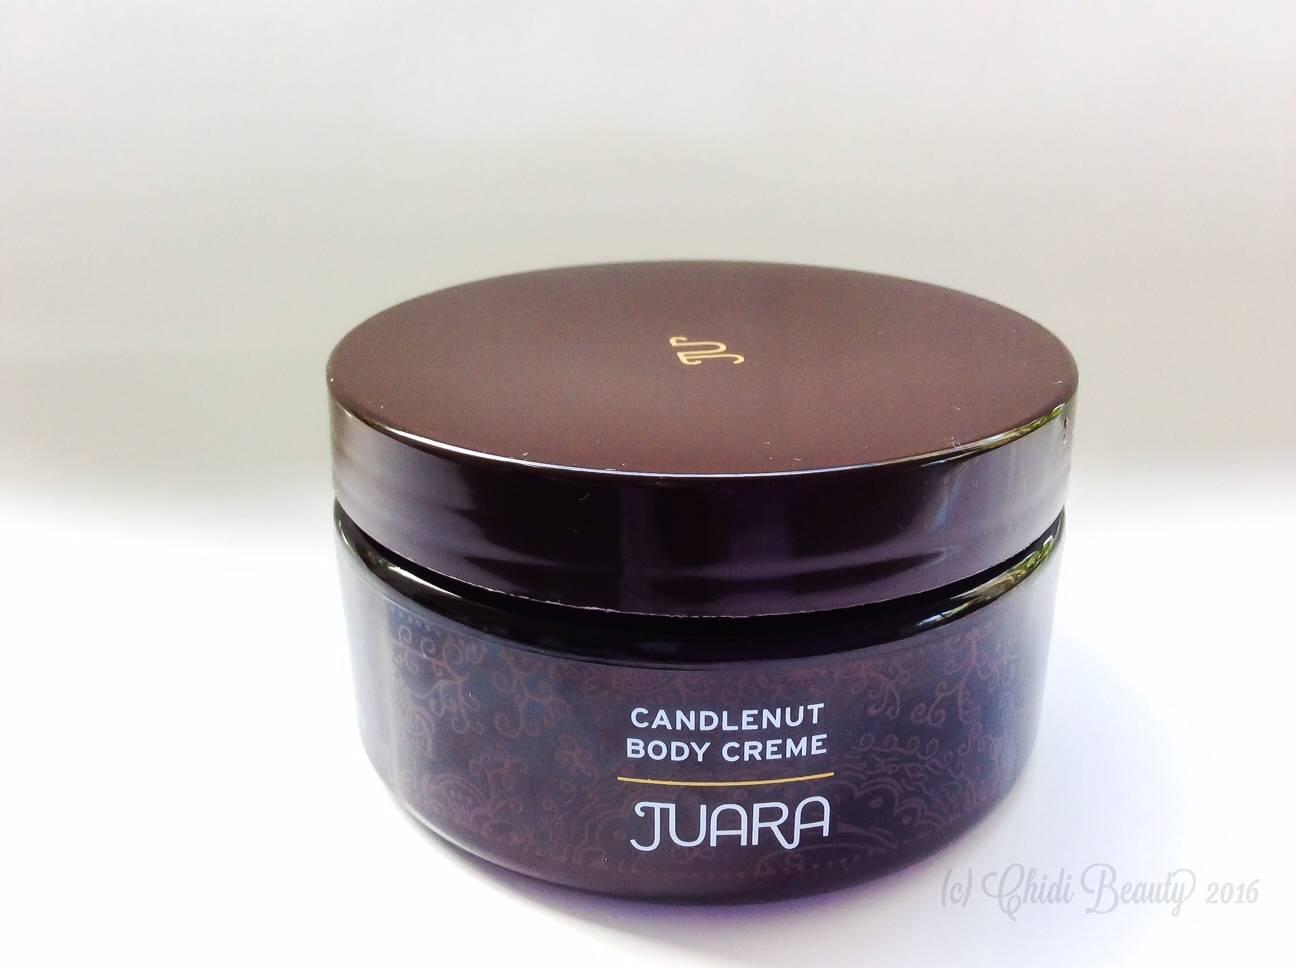 Juara Candlenut Body Creme Container • chidibeauty.com